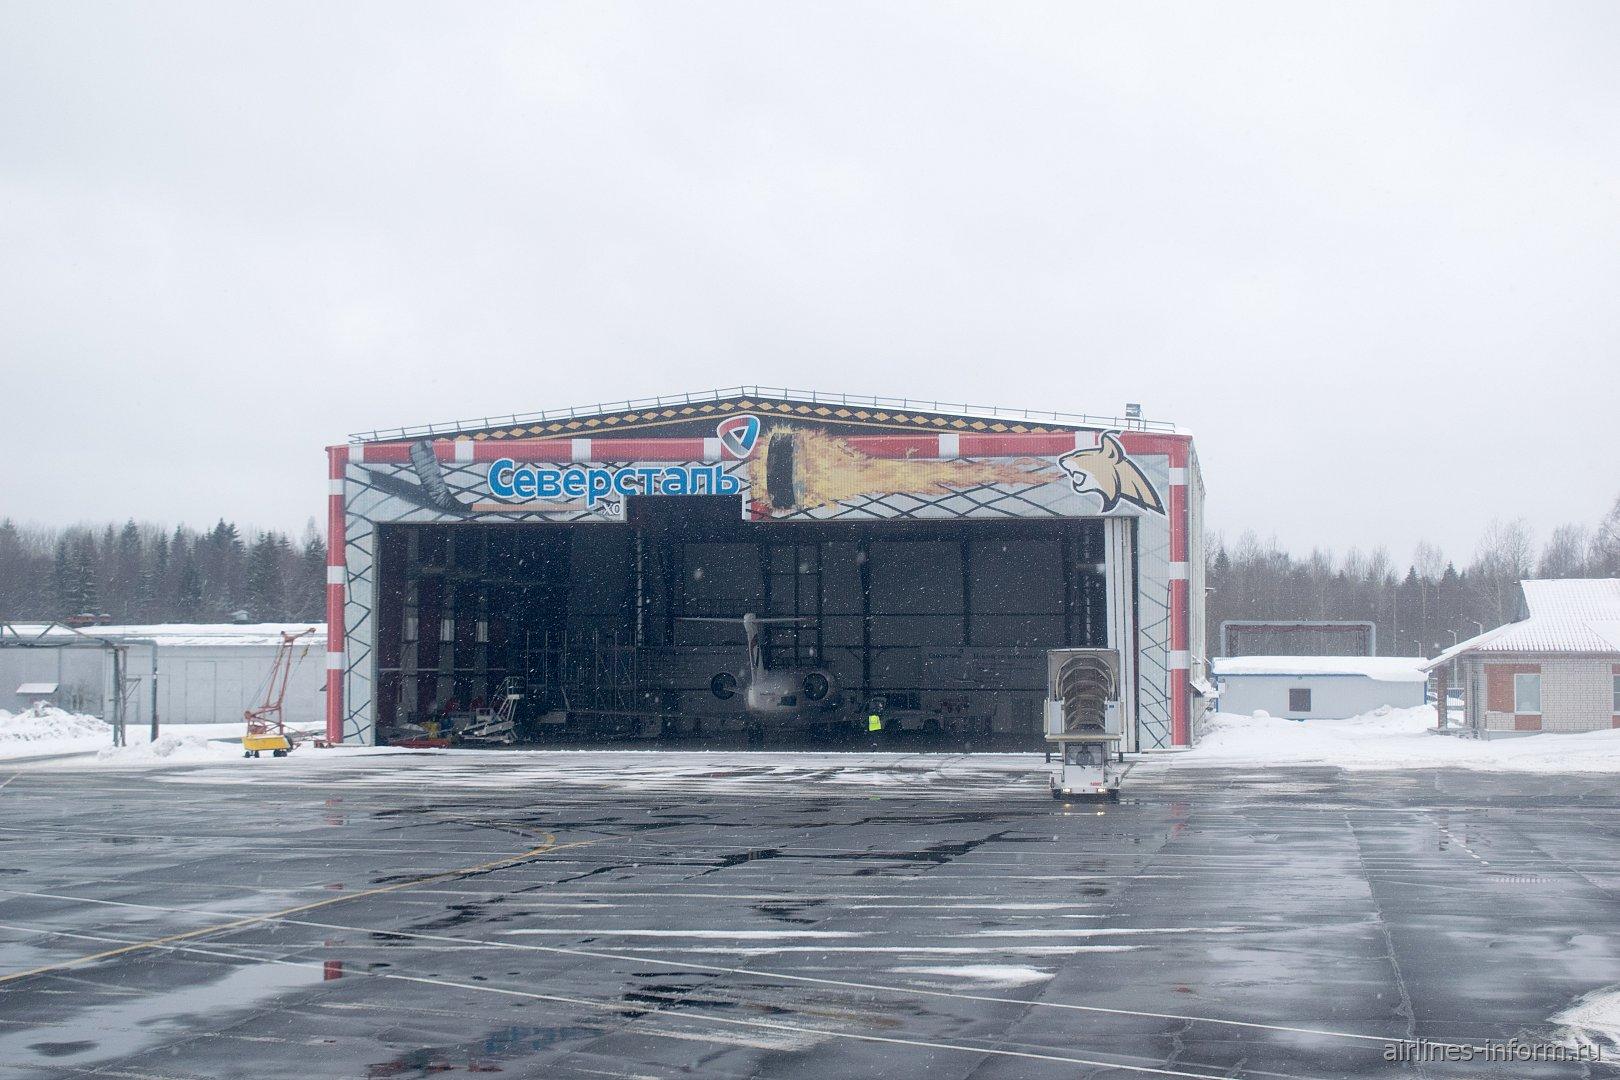 Ангар для обслуживания самолётов в аэропорту Череповец